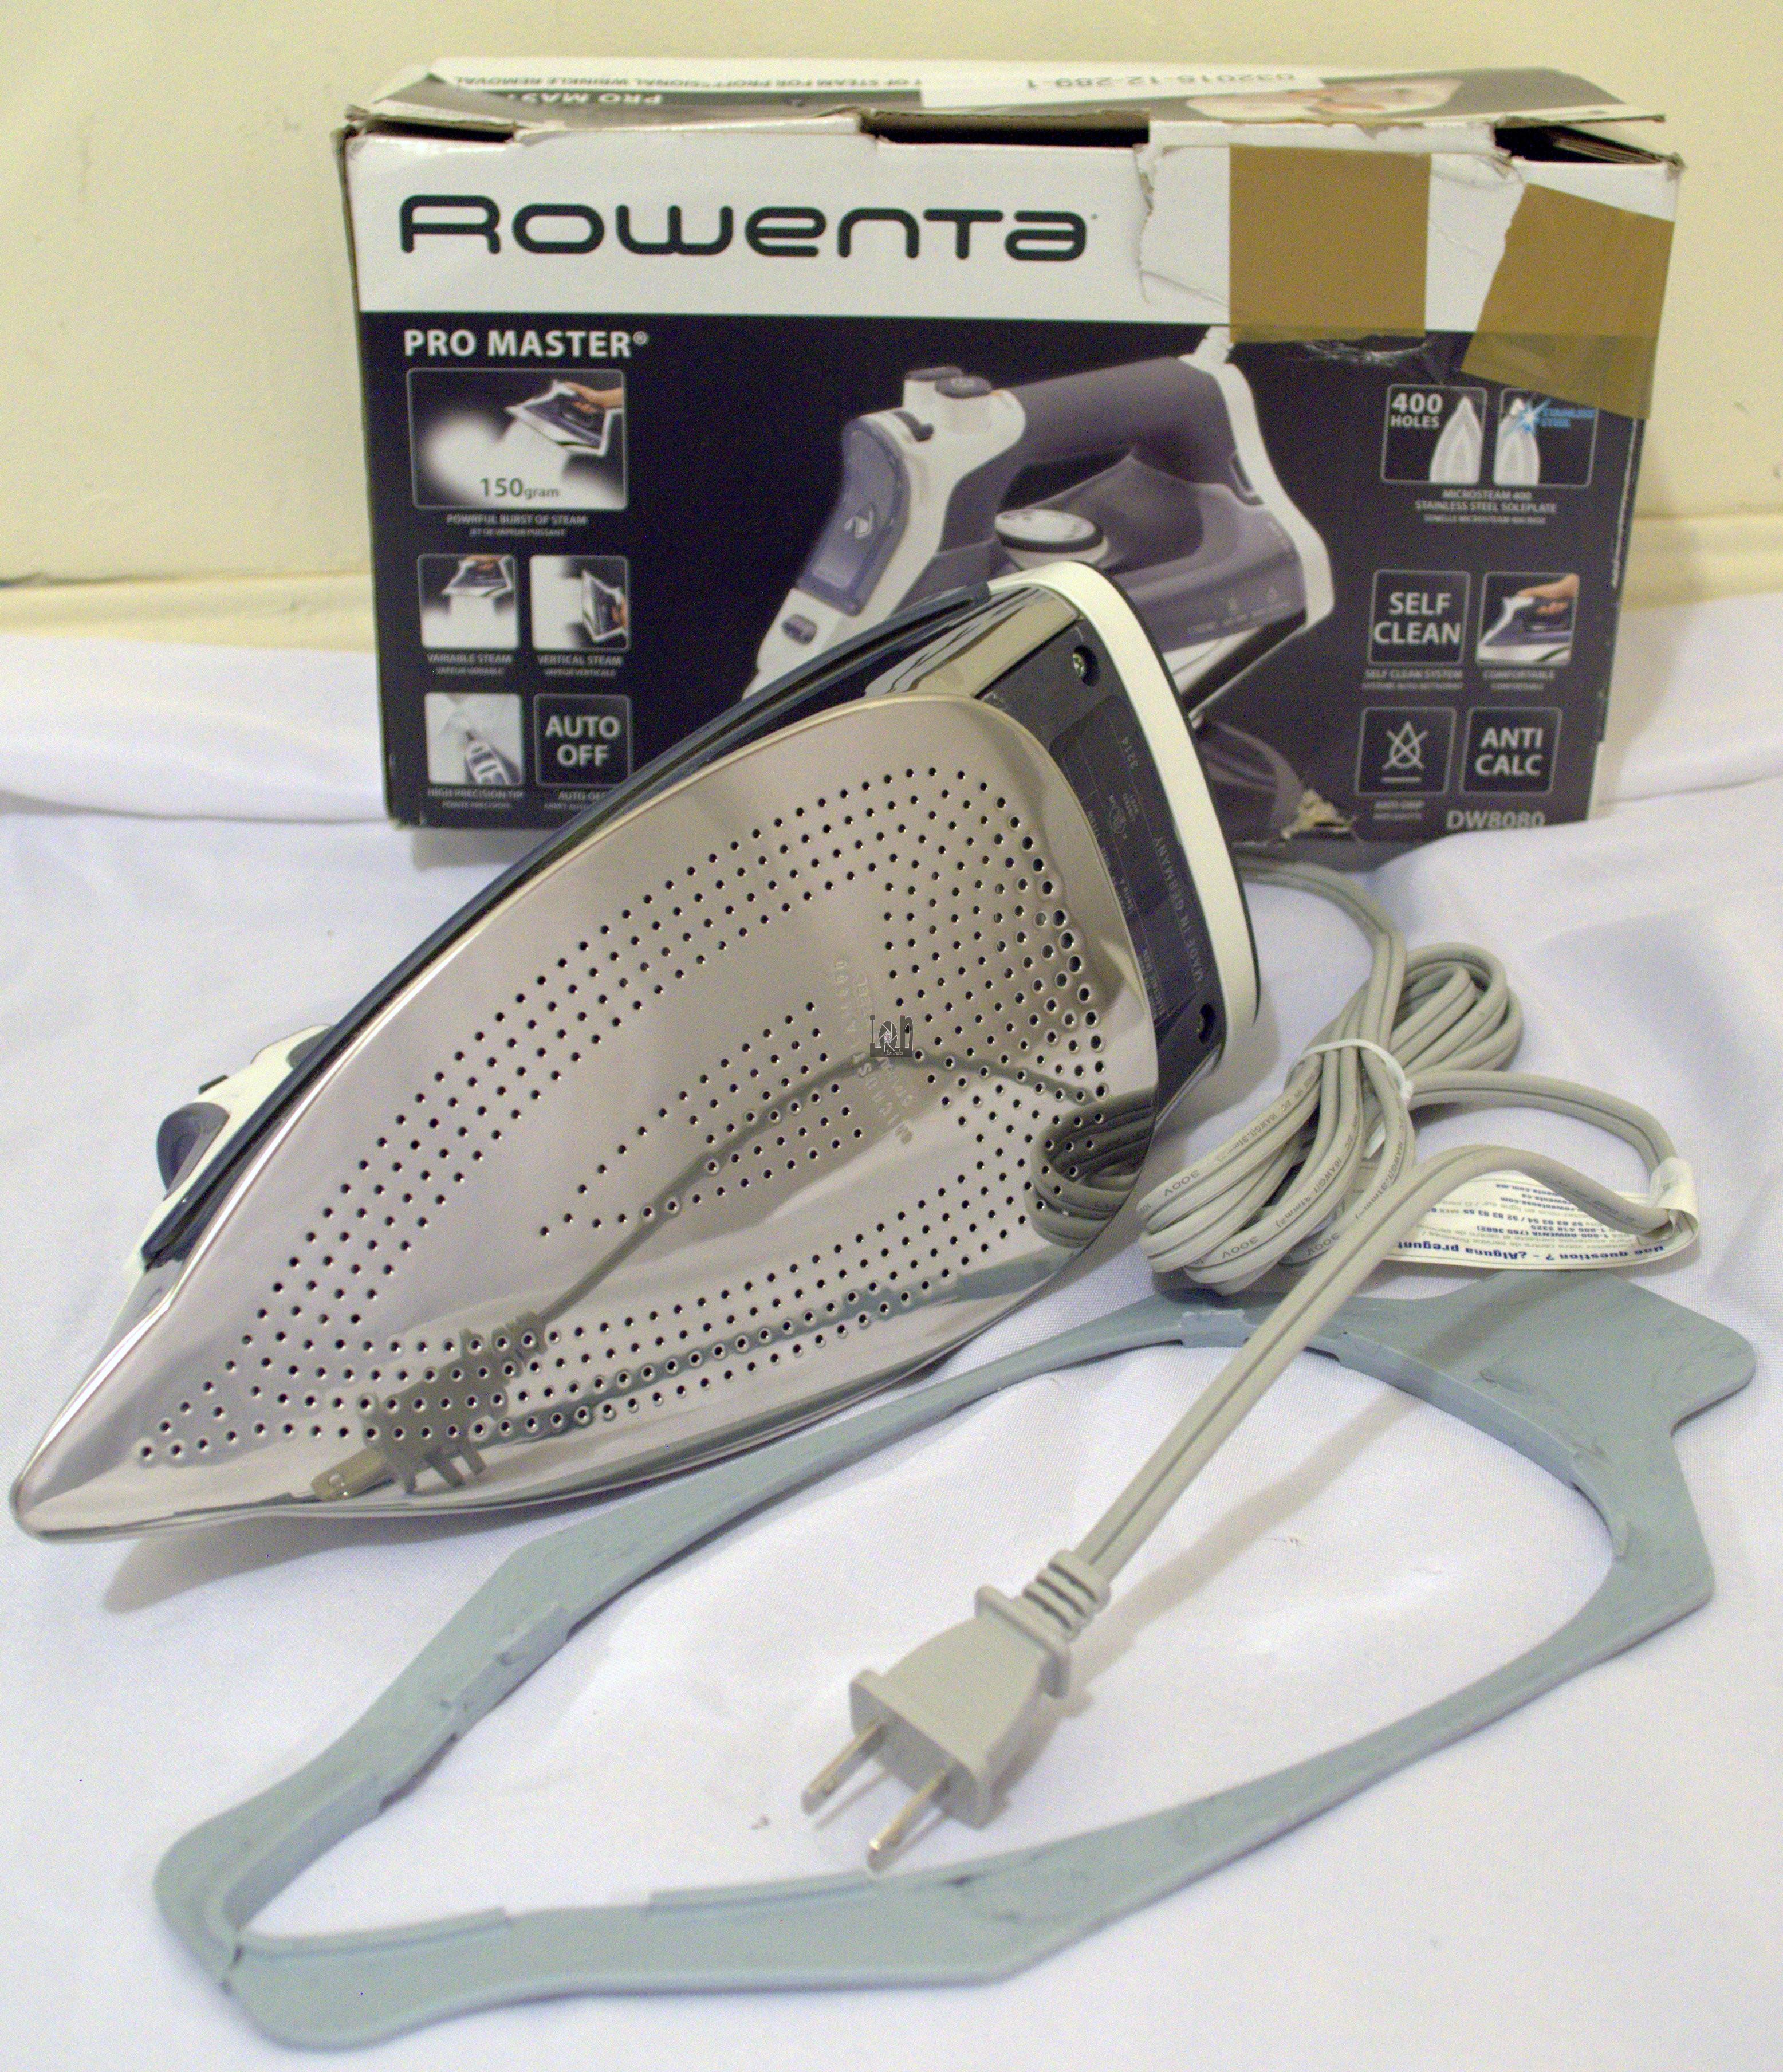 Rowenta DW8080 Clothes Iron Pro Master Steam Stainless